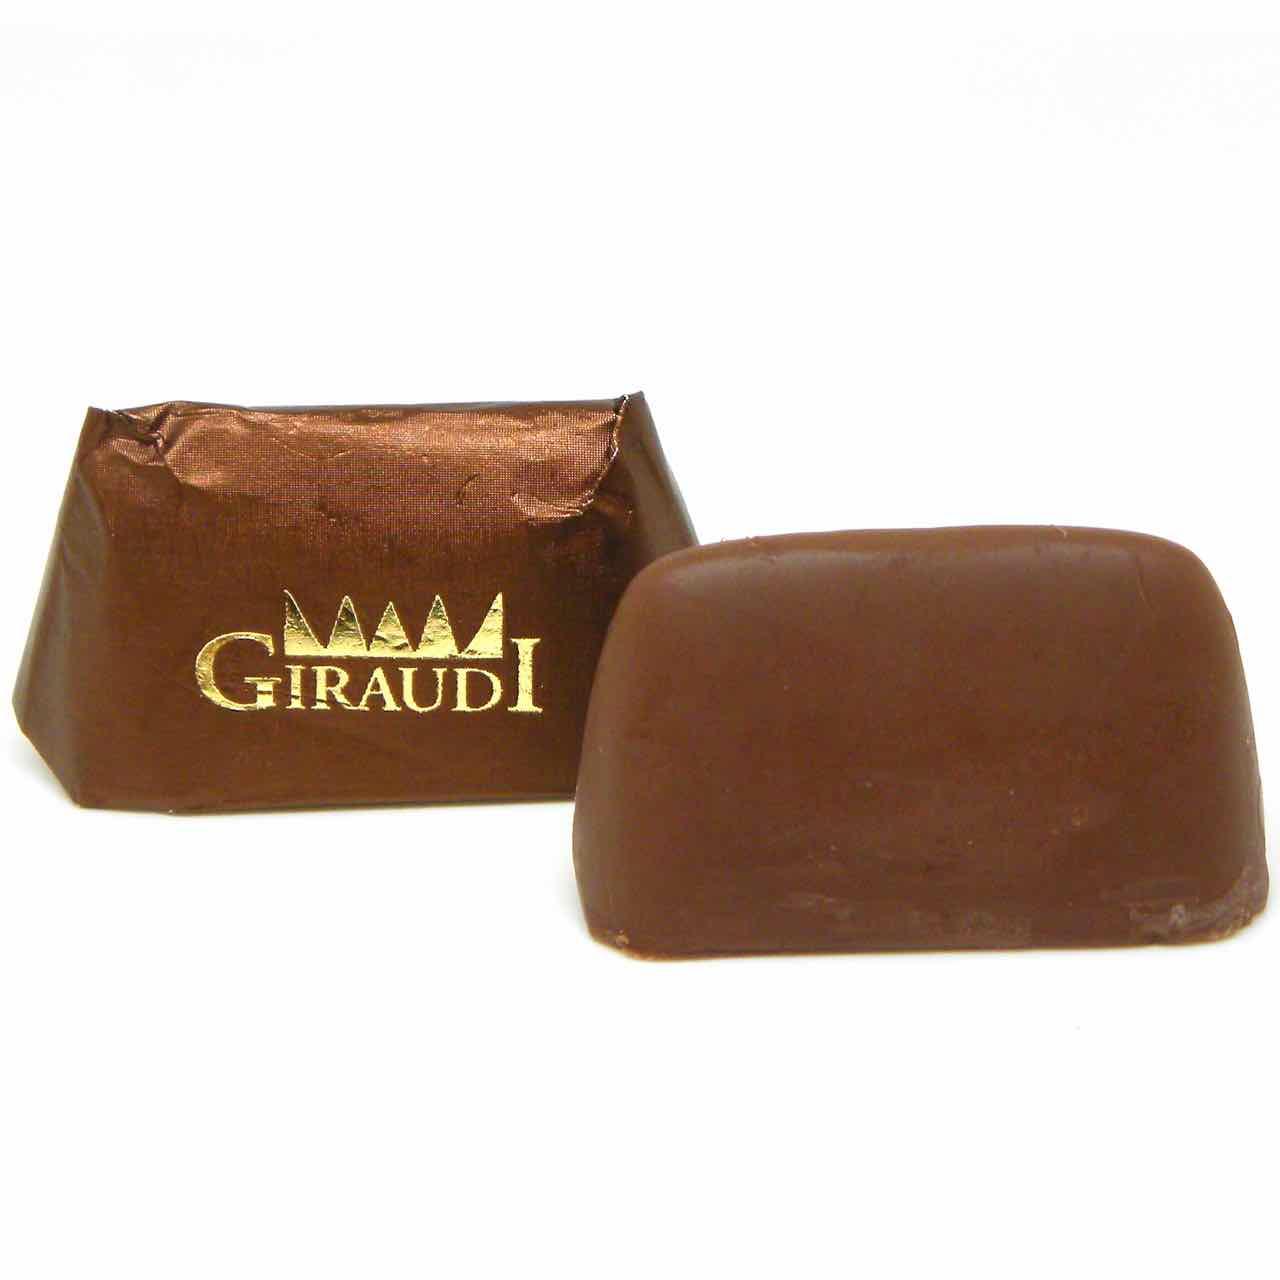 Giraudi Gianduiotti Fondenti – Giraudi Dark Chocolate Gianduiotti – gustorotondo – italian fine food online – prodotti tipici italiani online